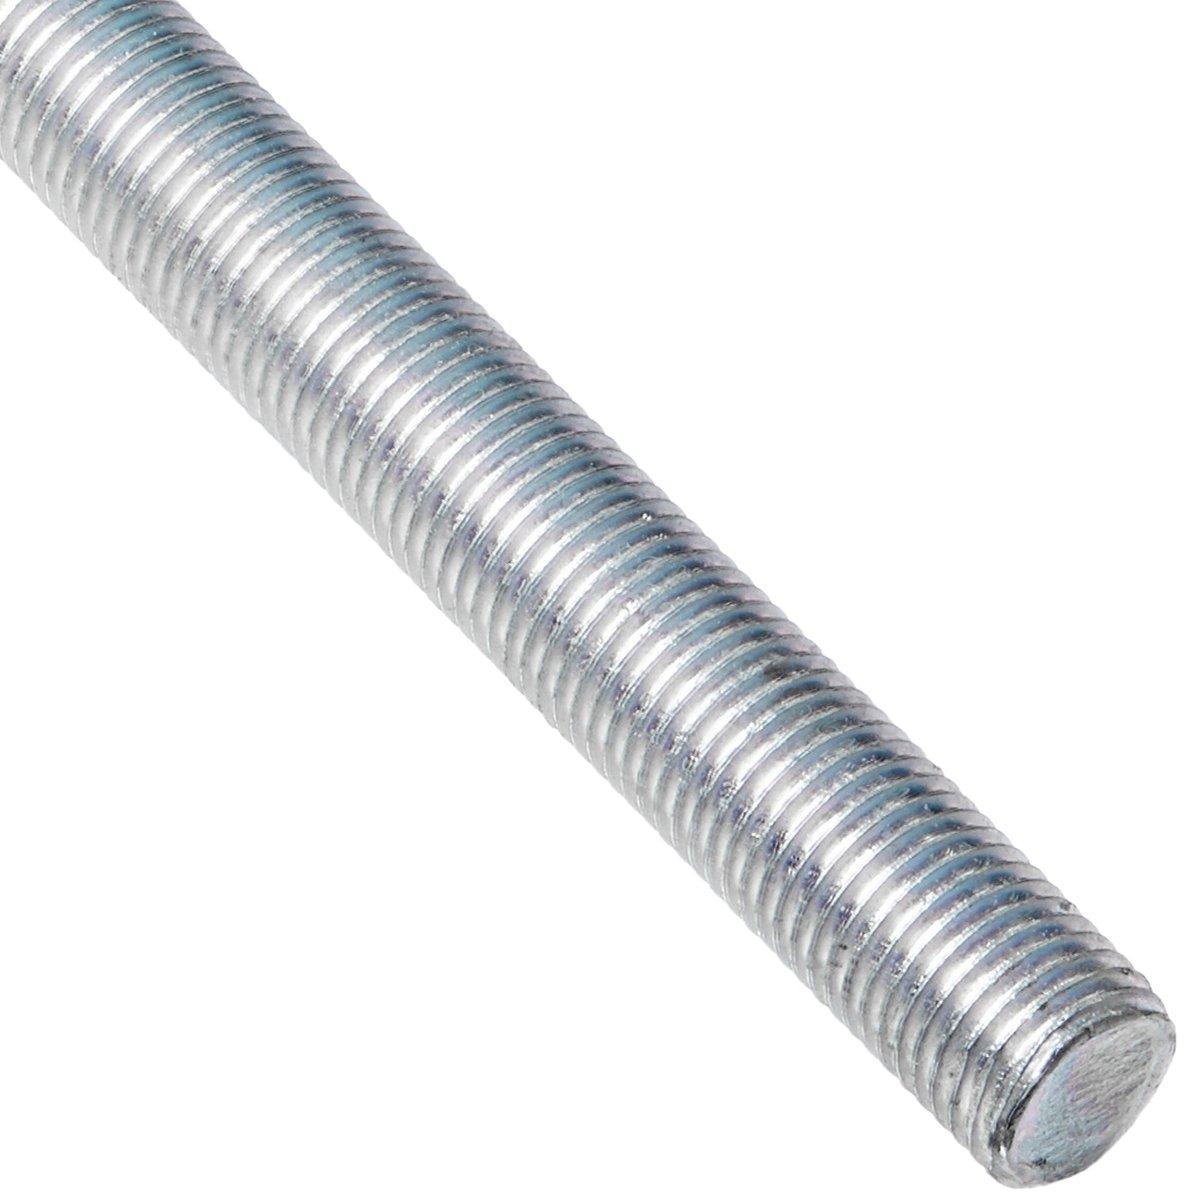 Steel Fully Threaded Rod 3//8-24 Thread Size Zinc Plated 24 Length Right Hand Threads 3//8-24 Thread Size 24 Length Small Parts 79220